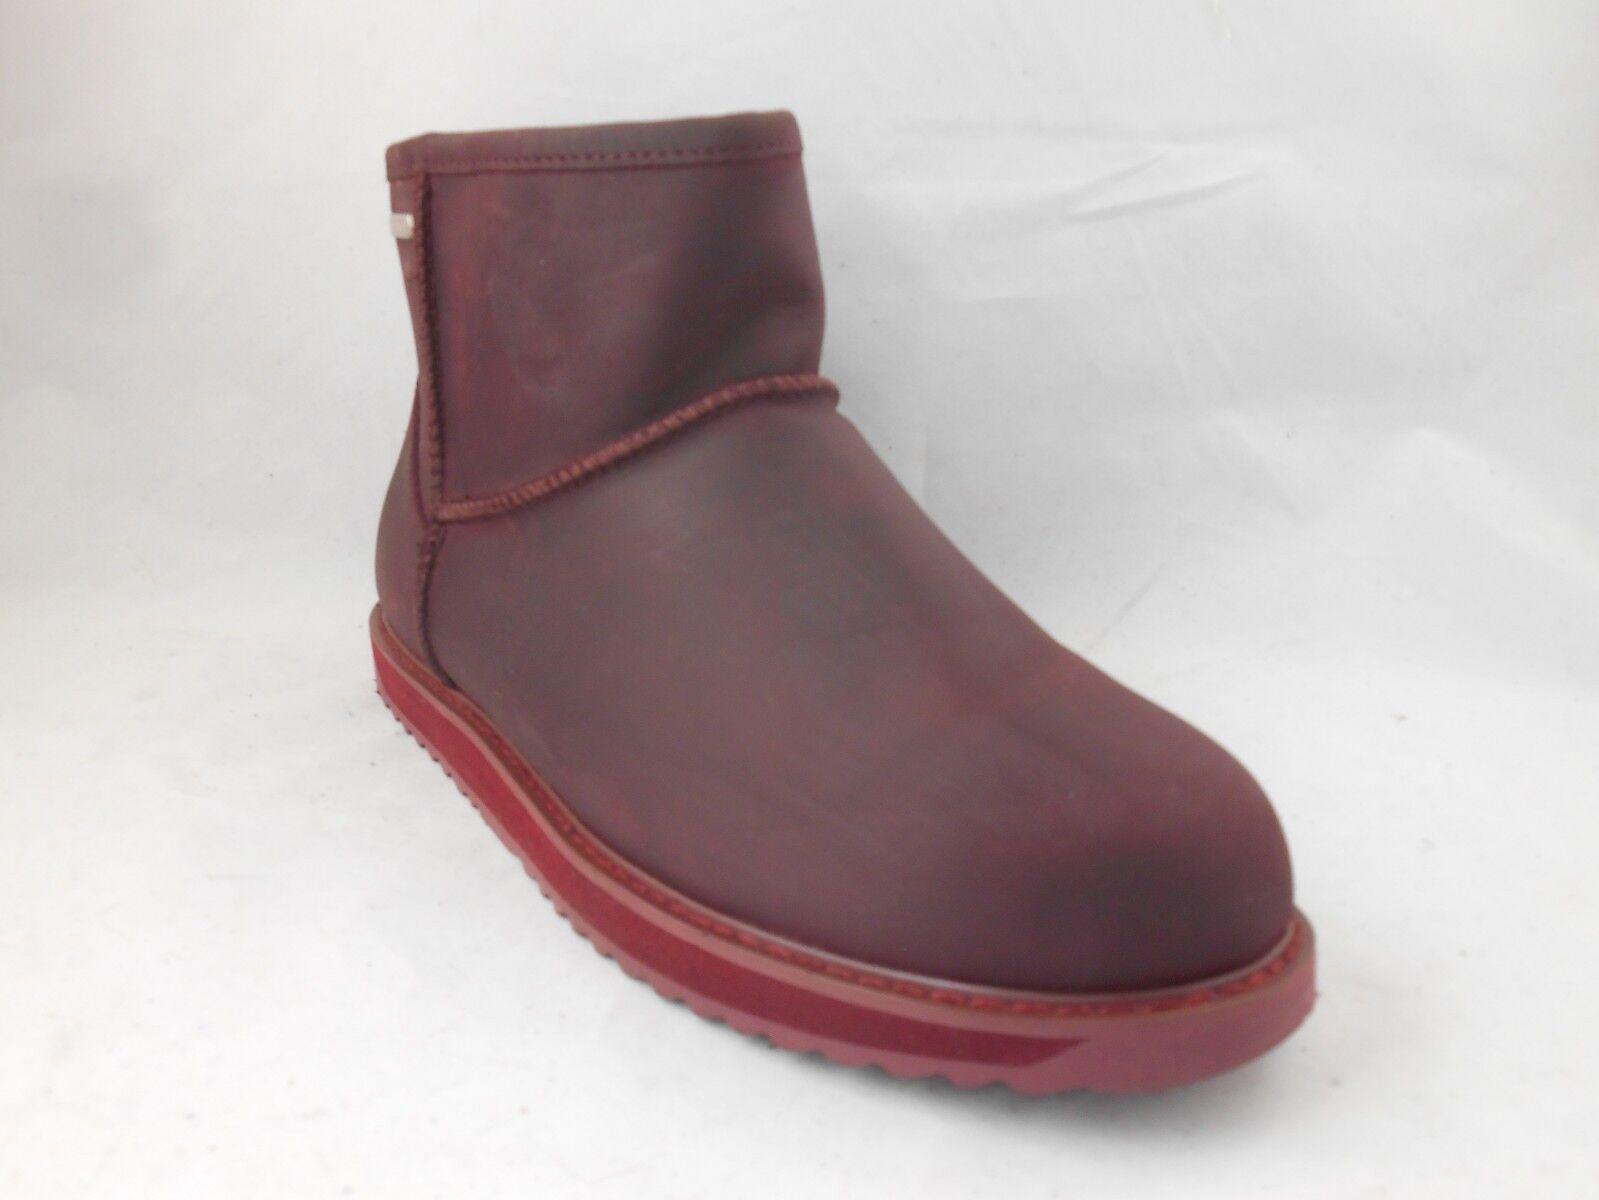 EMU Australia Paterson Wine Oiled Leather Sheepskin Lined Short Boots Wmns Sz 10